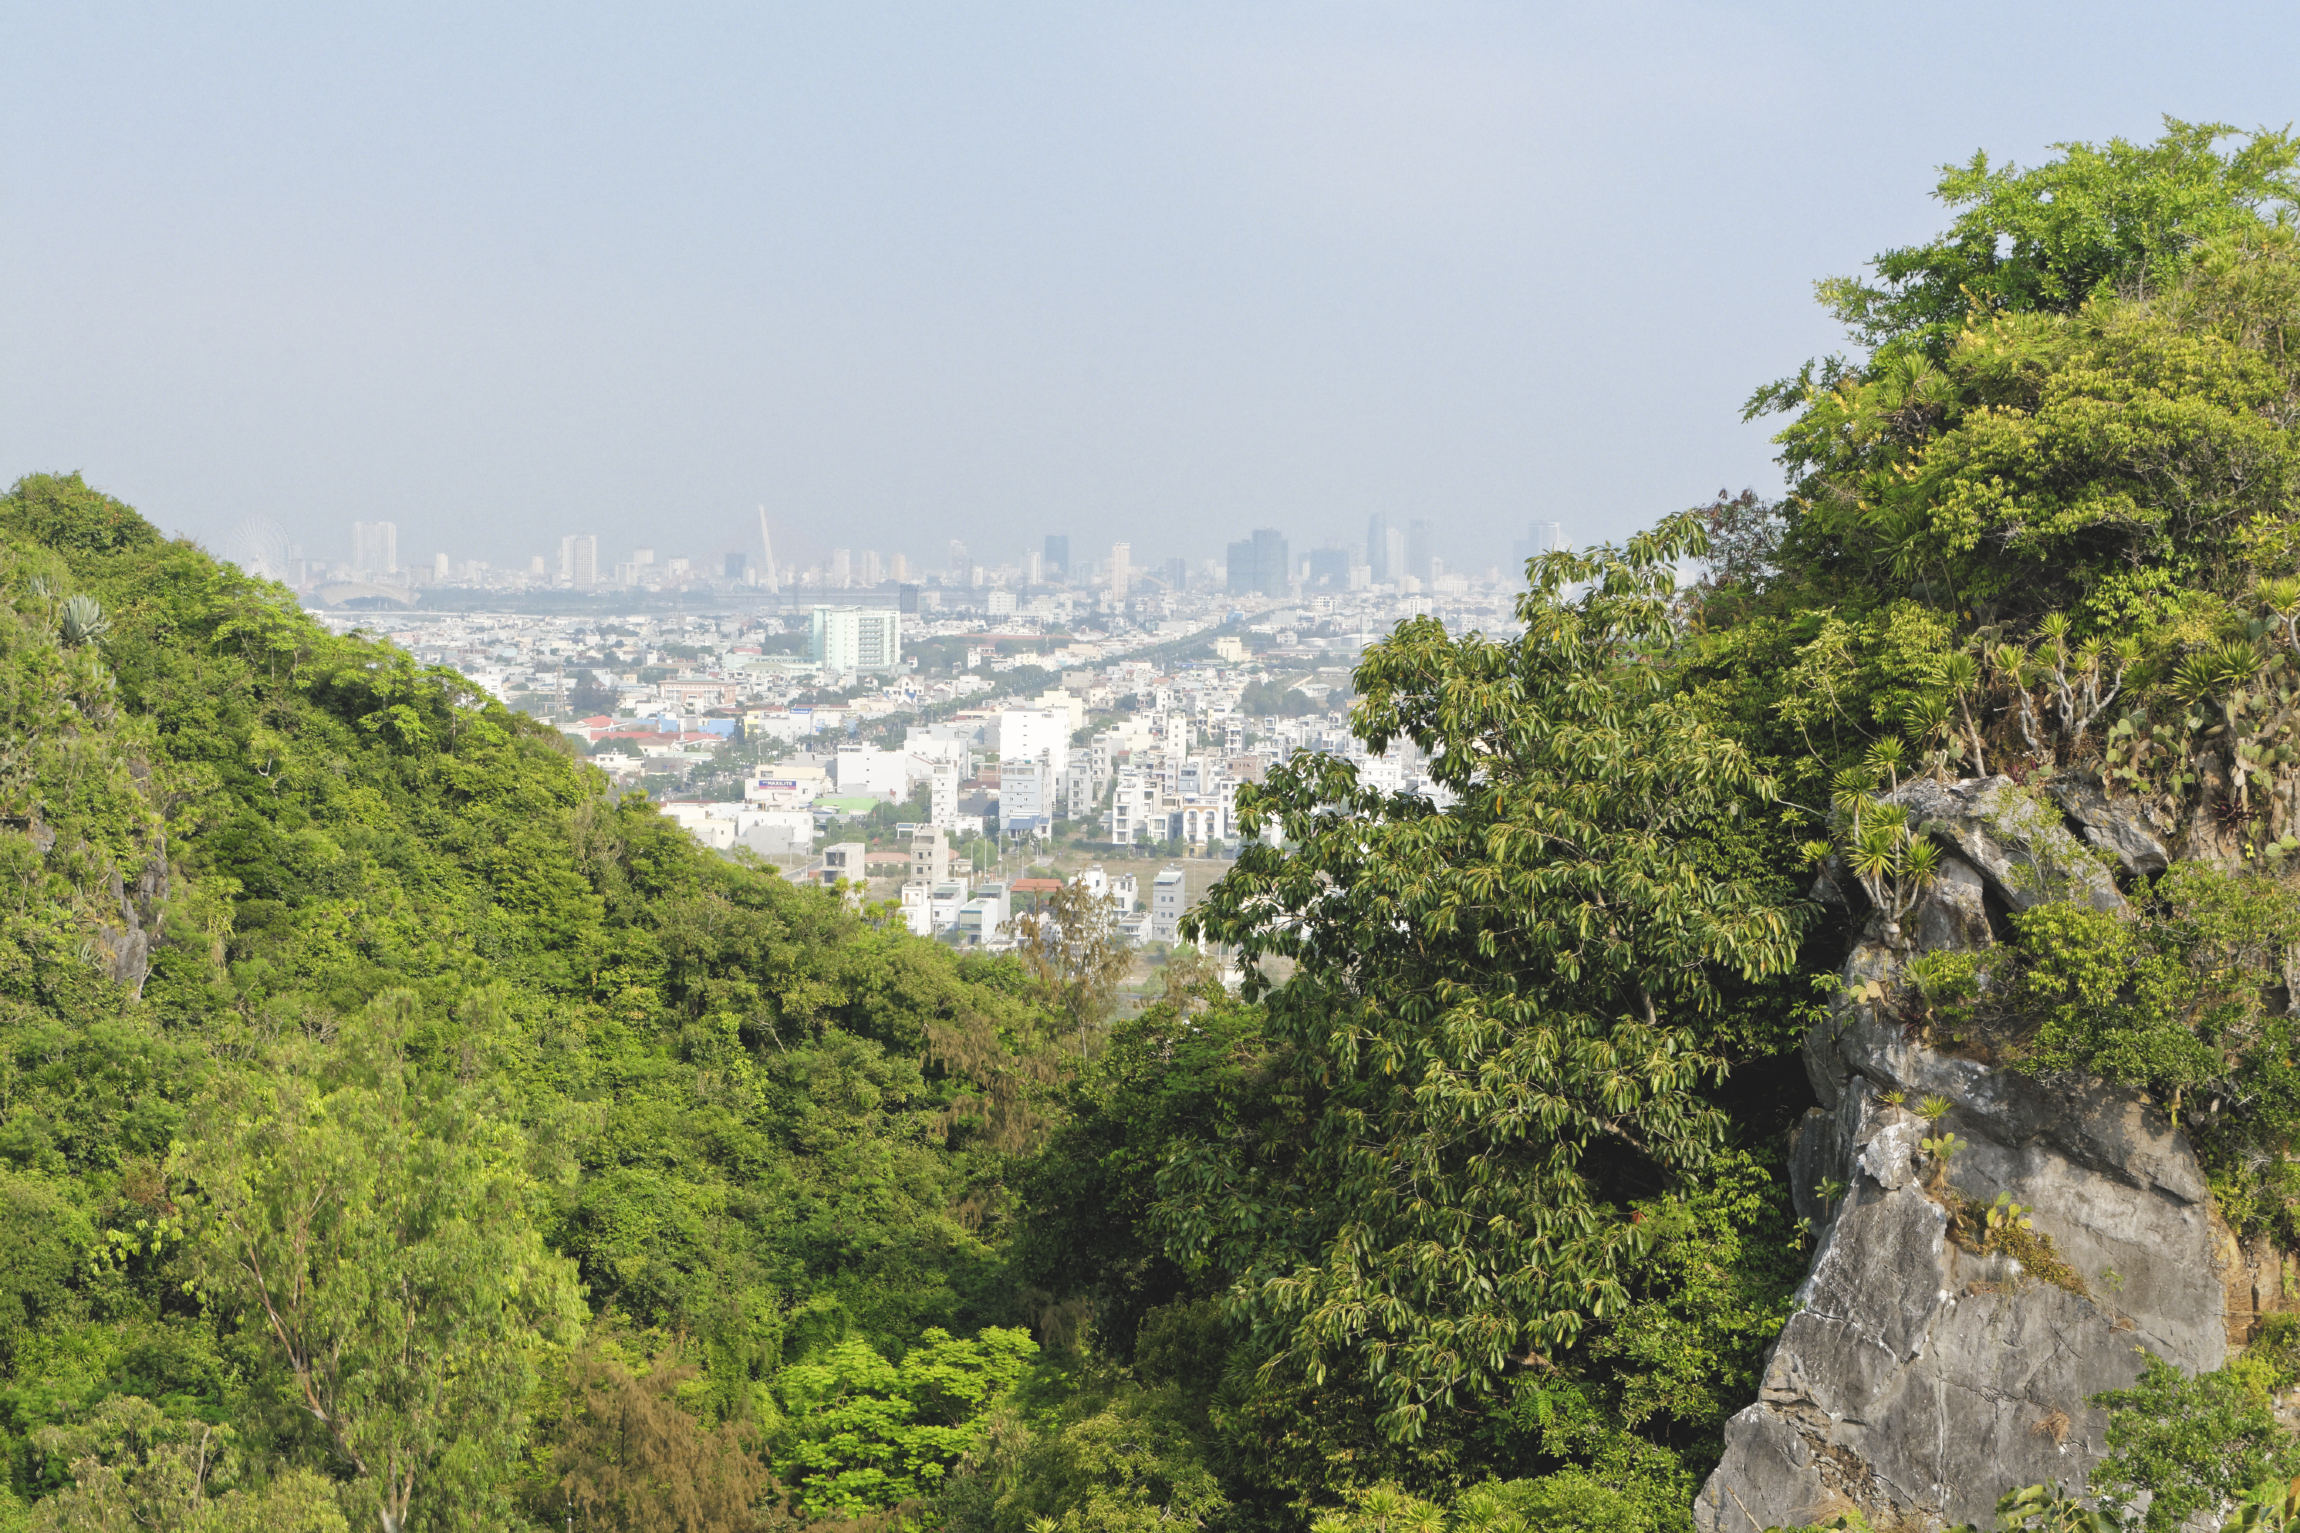 Vue sur Danang